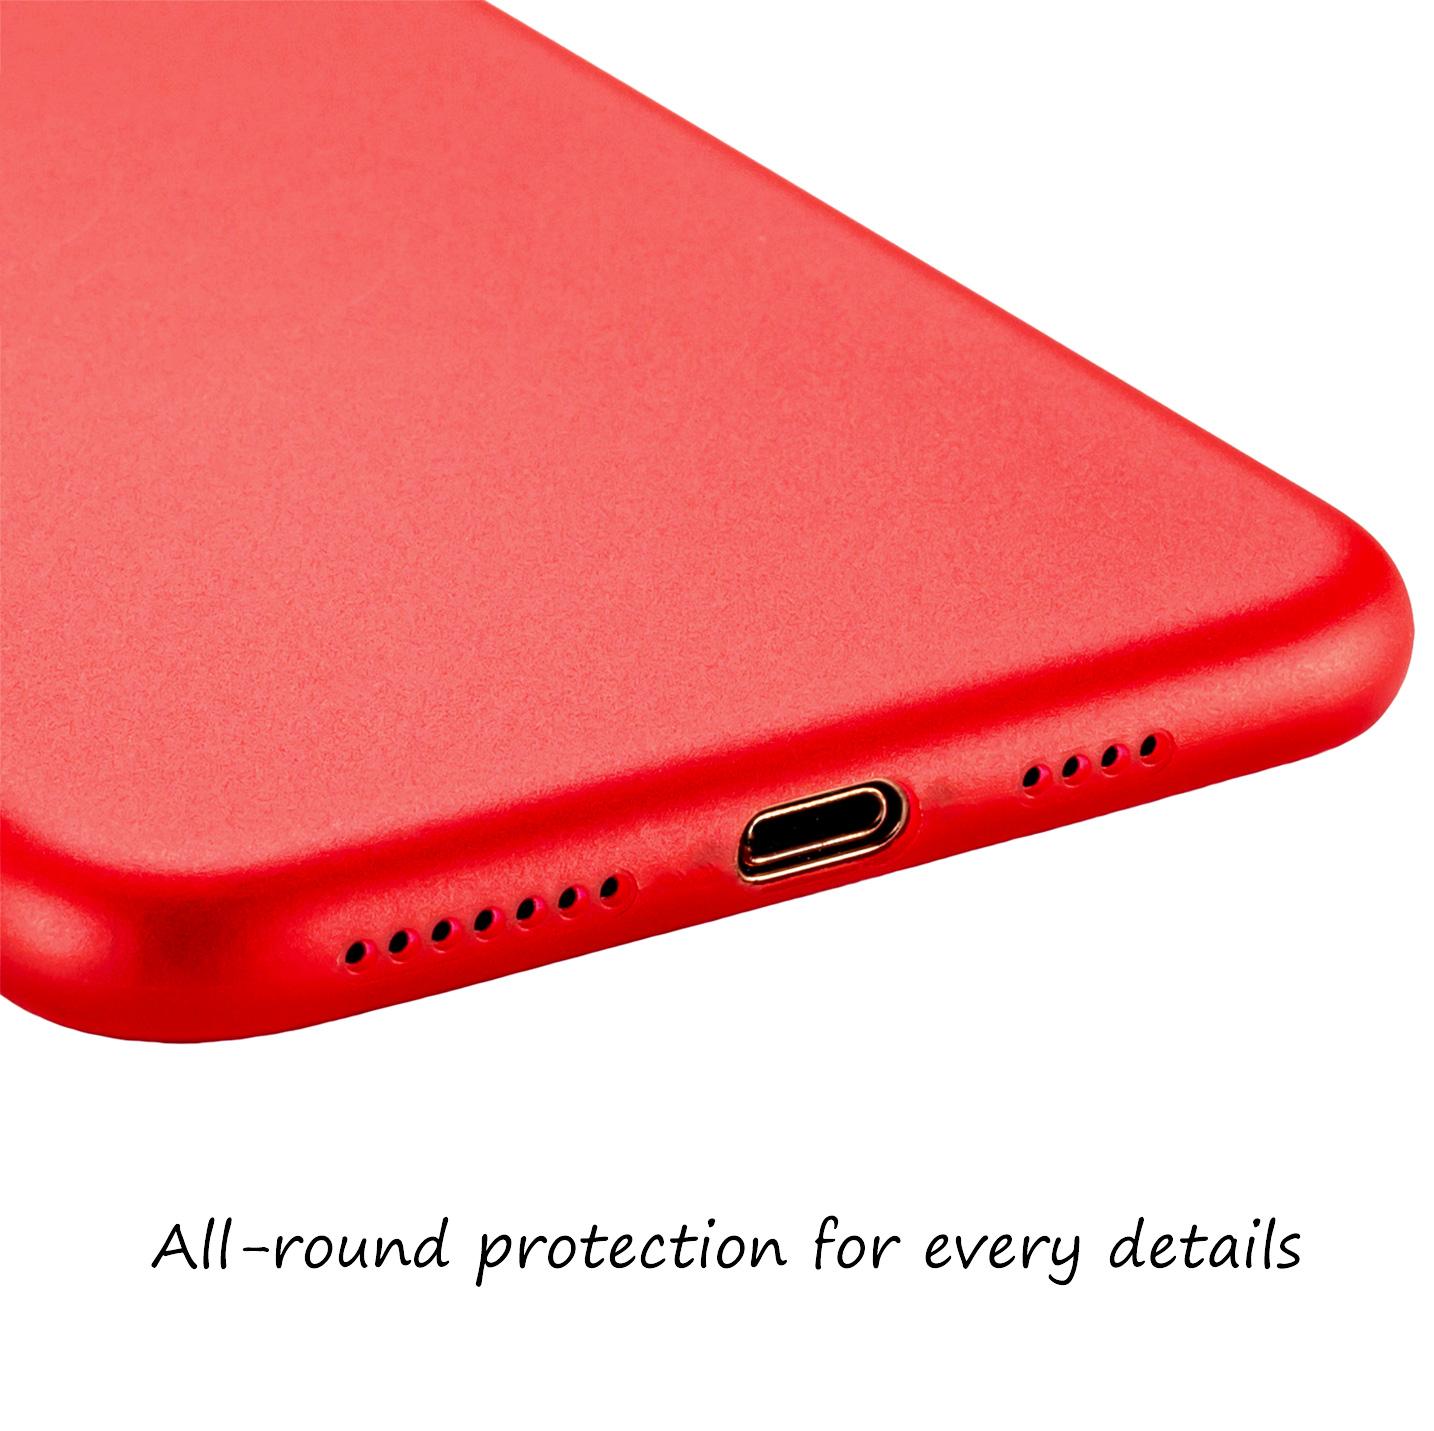 Ultra-Slim-Case-iPhone-11-Pro-5-8-034-Matt-Clear-Schutz-Huelle-Skin-Cover-Etui-Folie Indexbild 48